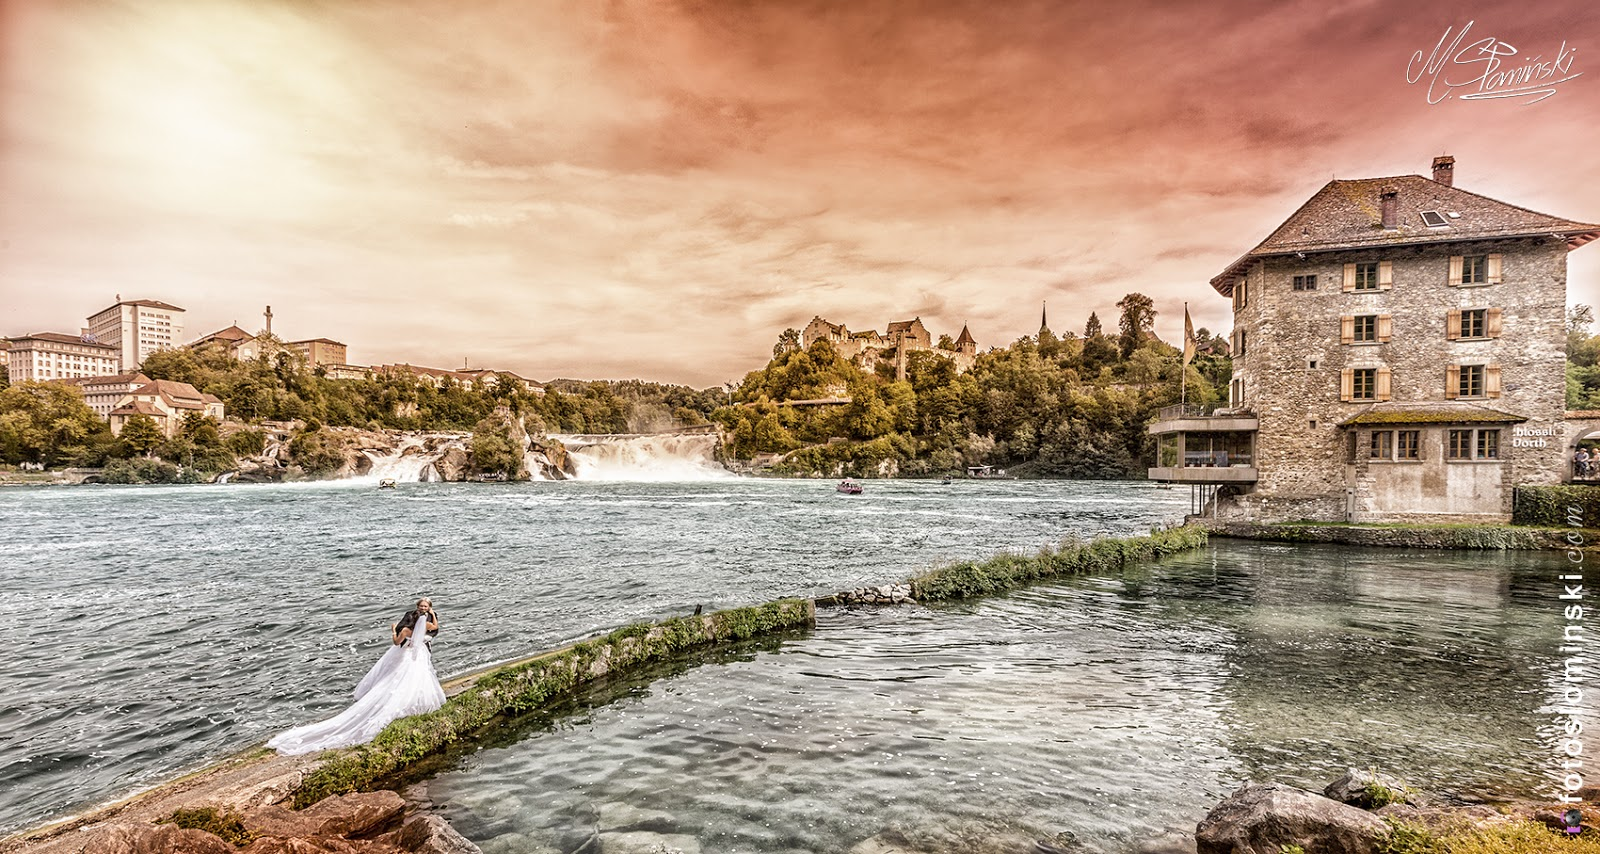 #ZdjęciaSłomińskiego and Amazing #Rheinfall #schaffhausen #Neuhausen in #Swiss #Switzerland Back this year.